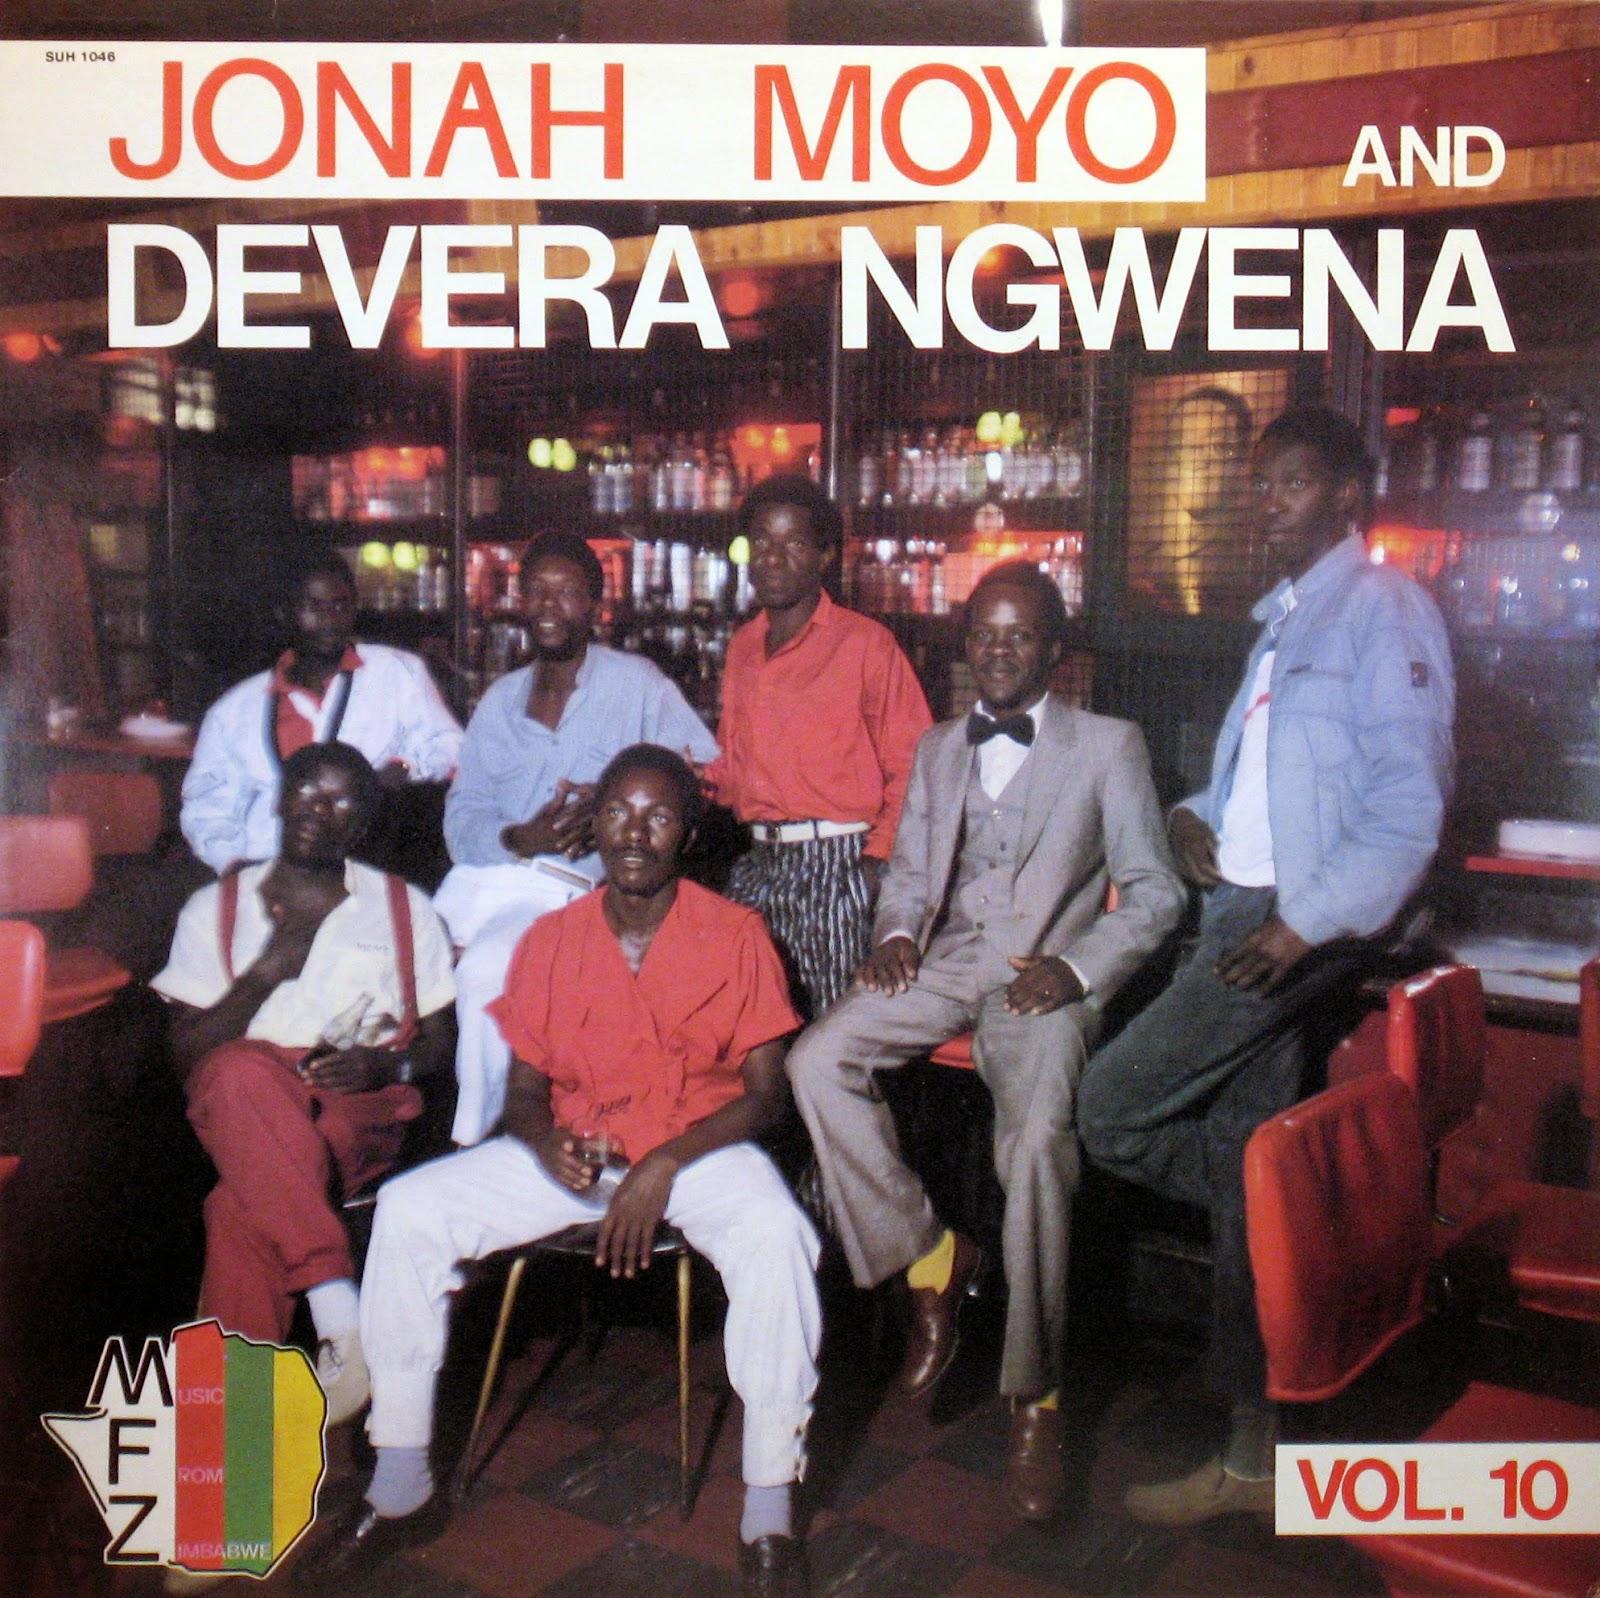 Jonah moyo & devera ngwena -- debbie youtube.